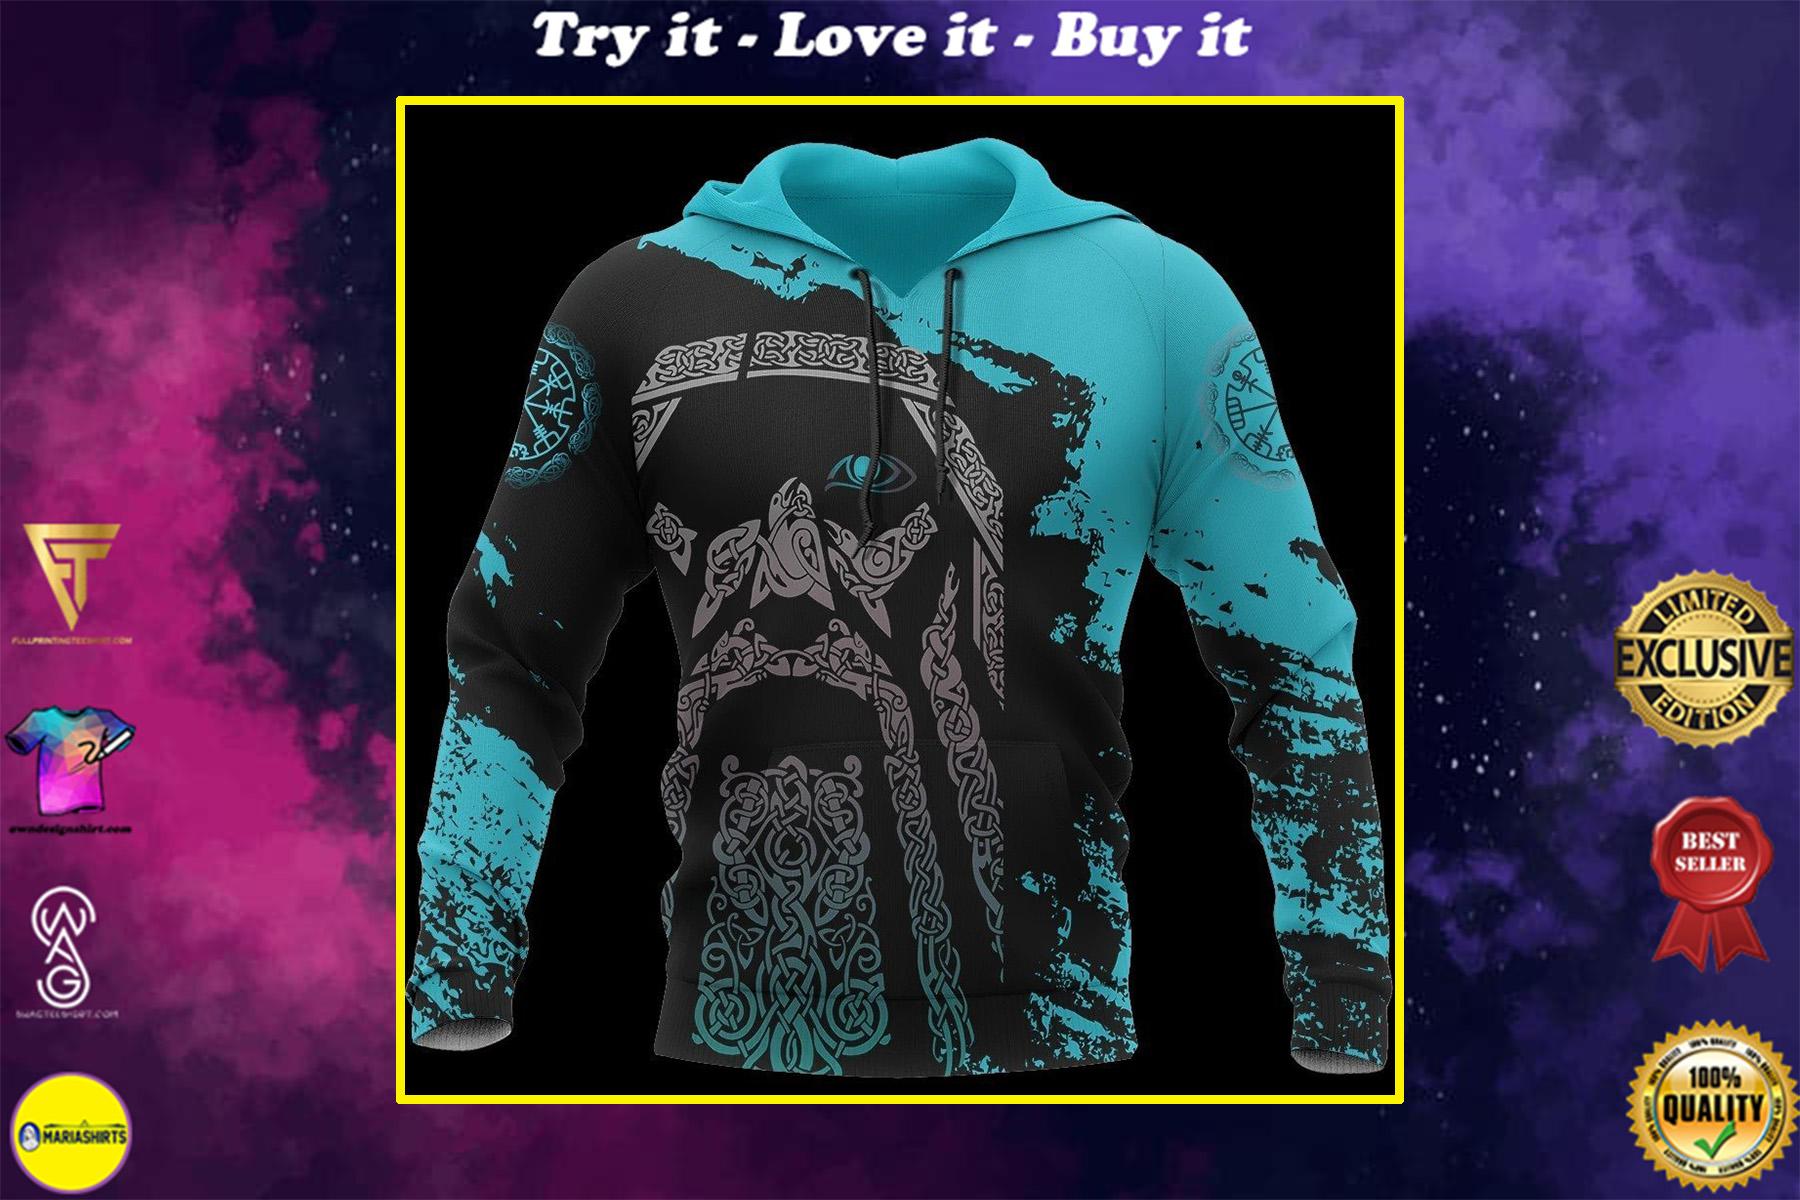 viking odin wotan all over printed shirt